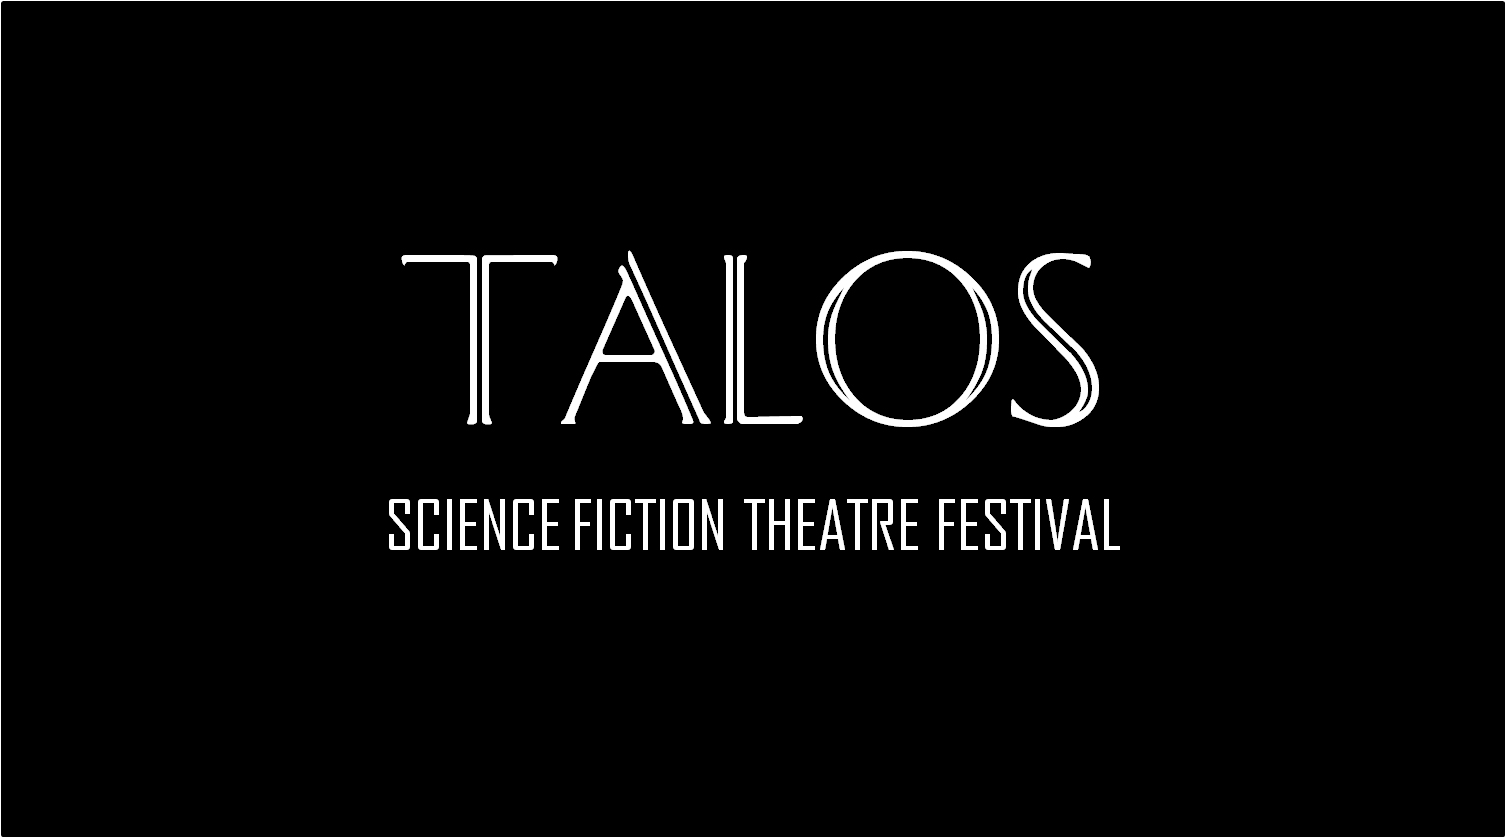 Image for Talos.jpg